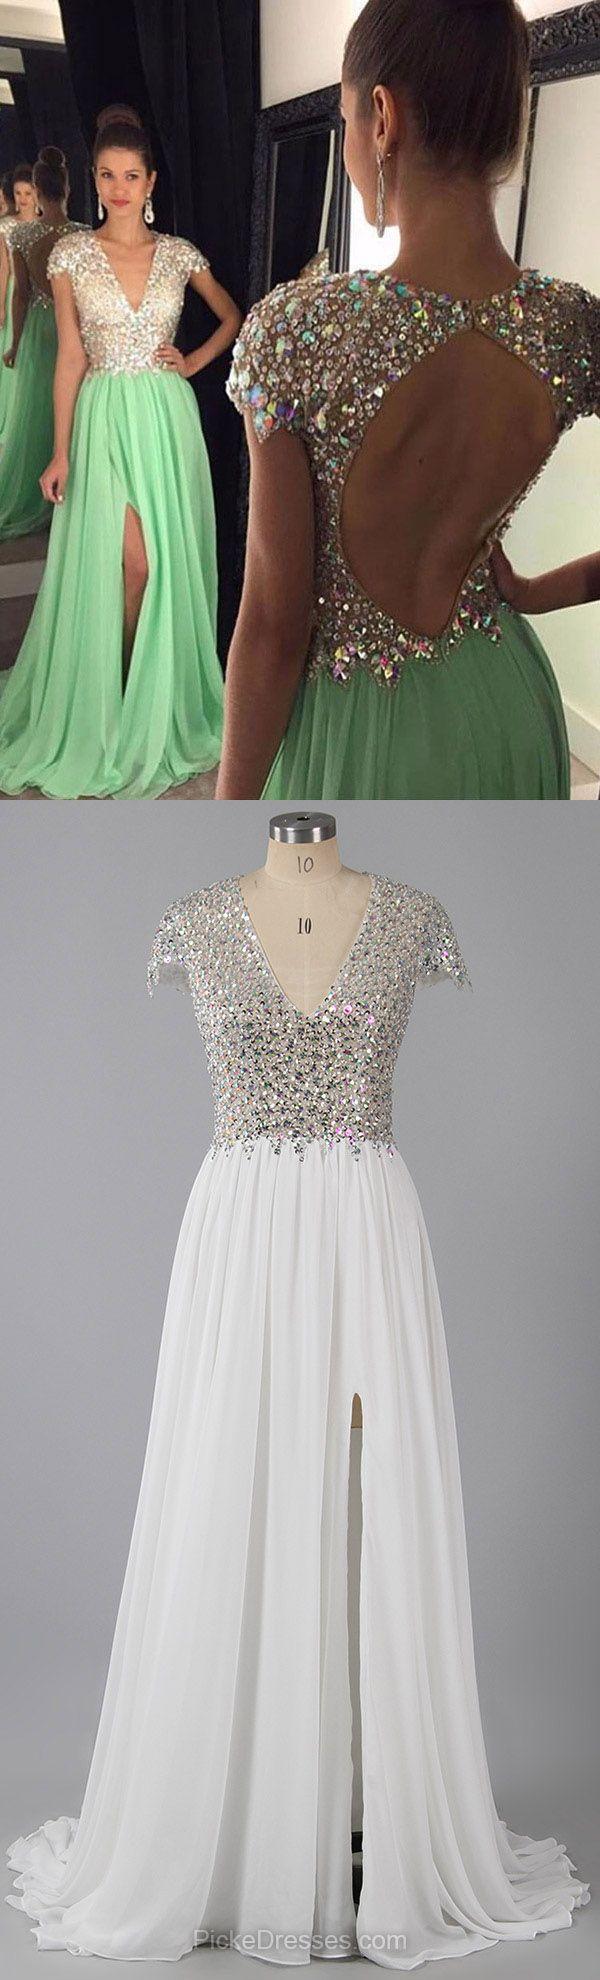 Green prom dresses long prom dresses for teens vneck formal